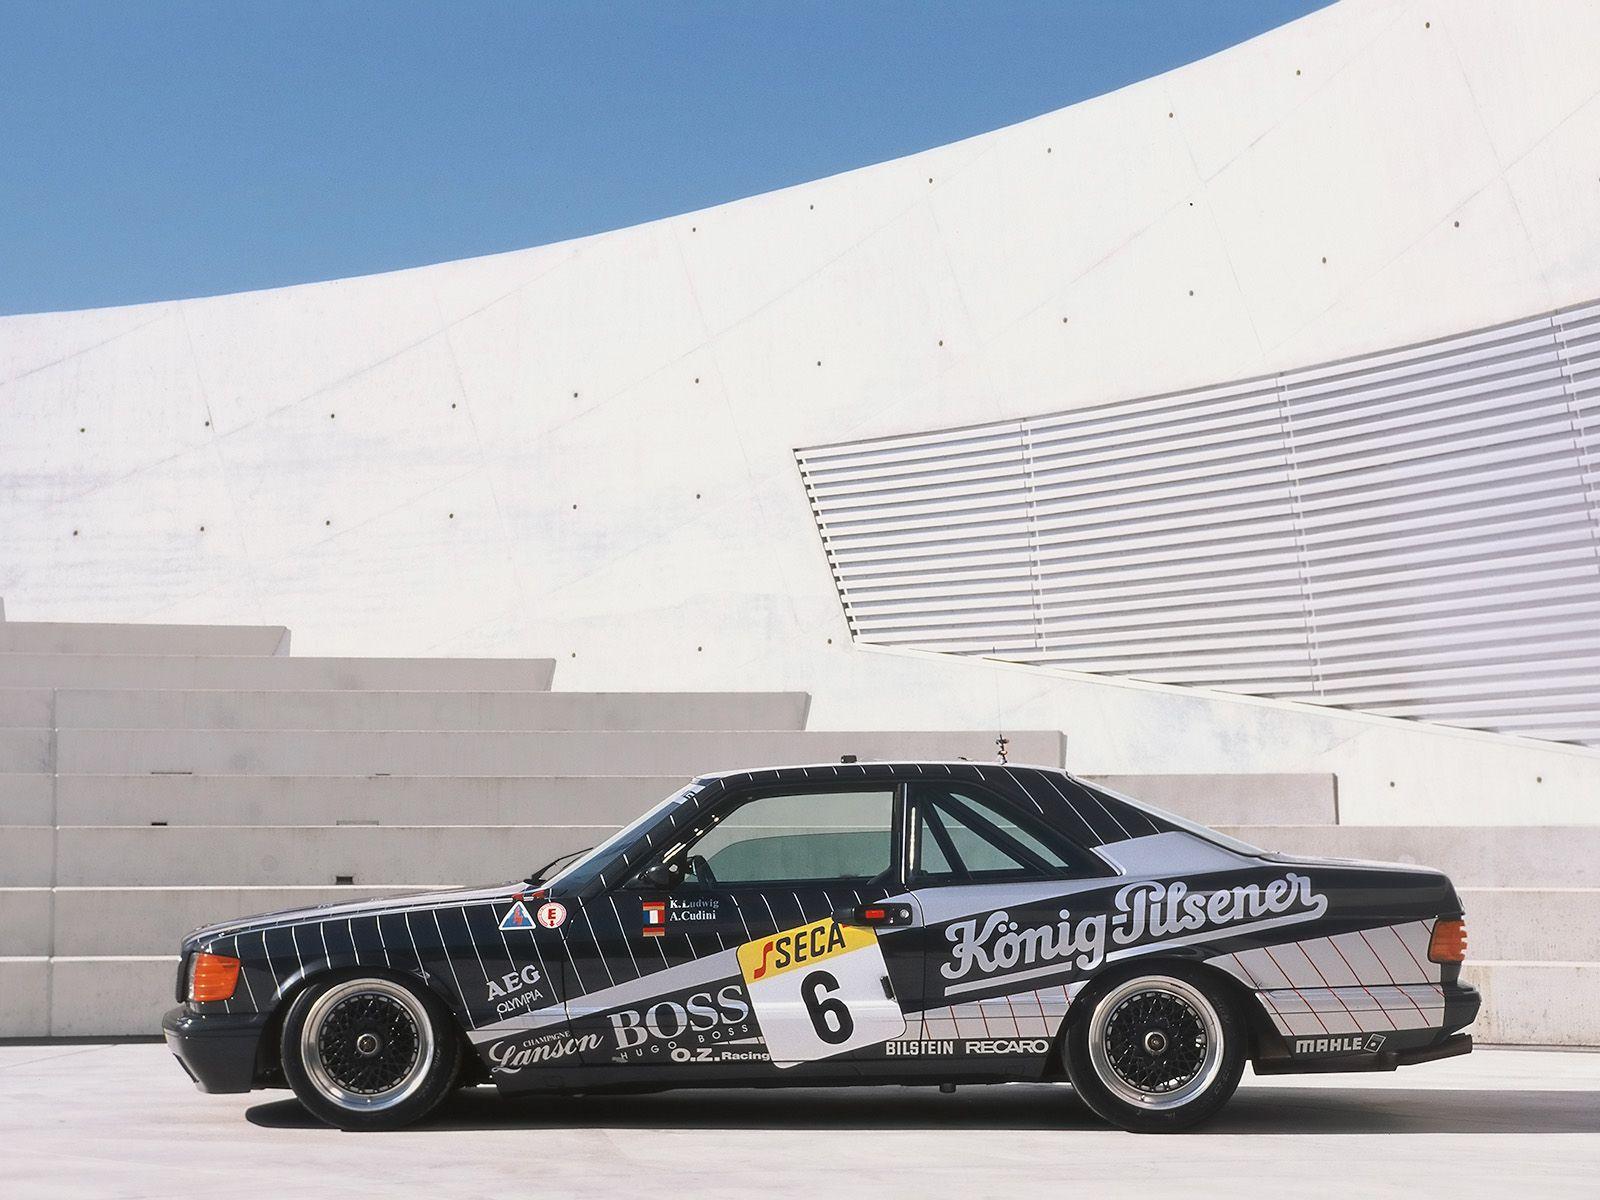 How many amg 6 0 4v w126 sec and sel cars were built amg side shot - Mercedes Sec Amg